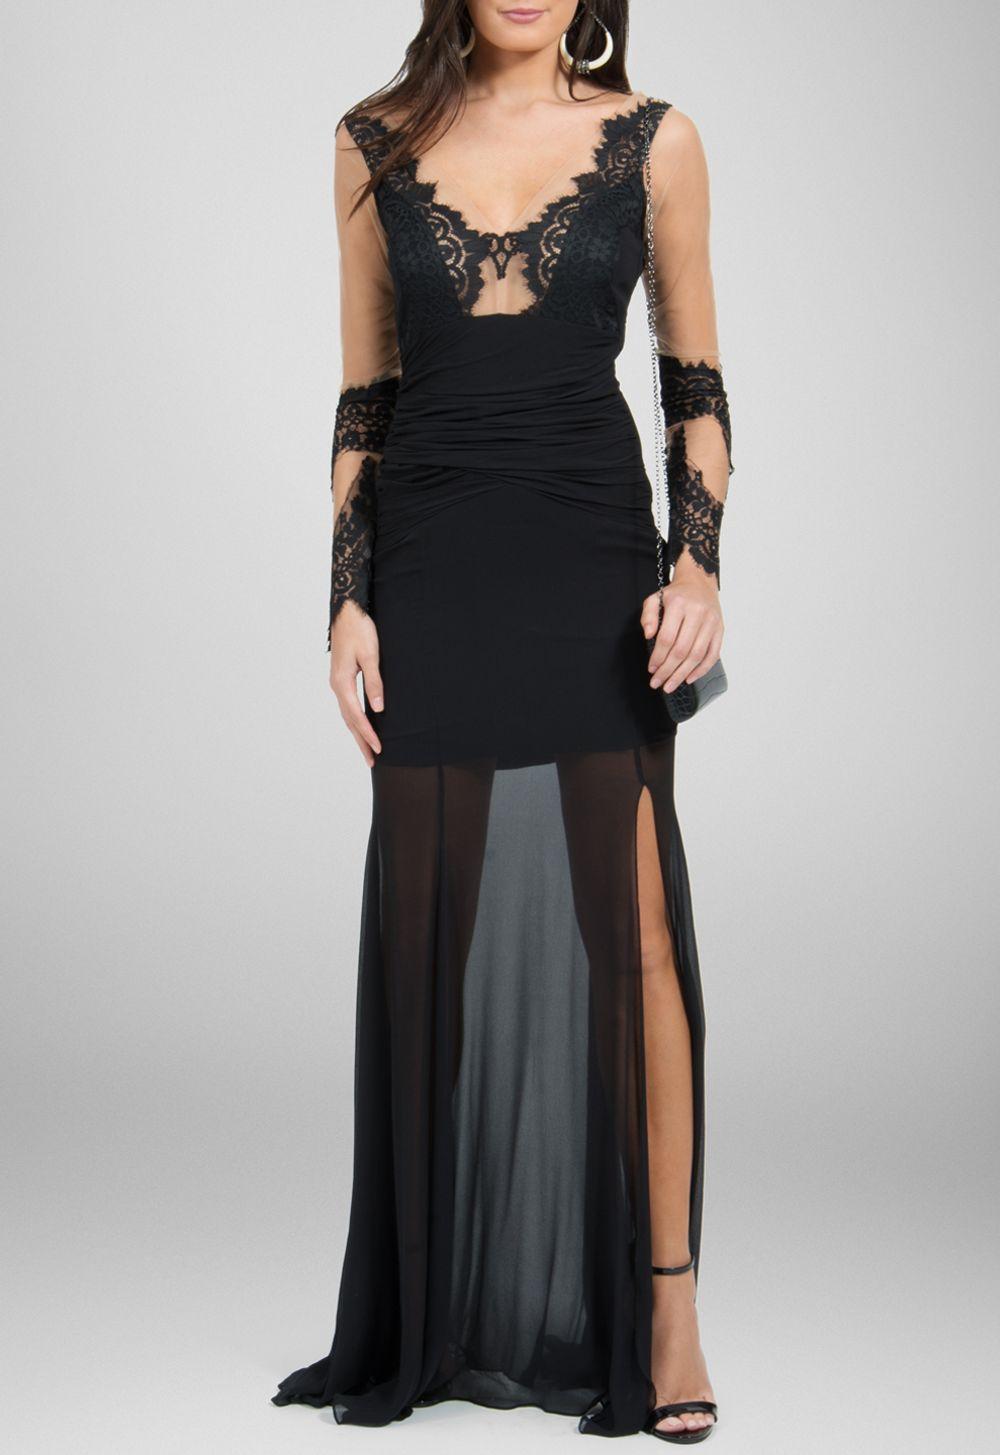 49fd95ad0 Vestido longo de seda com transparência preto Agilitá - powerlook